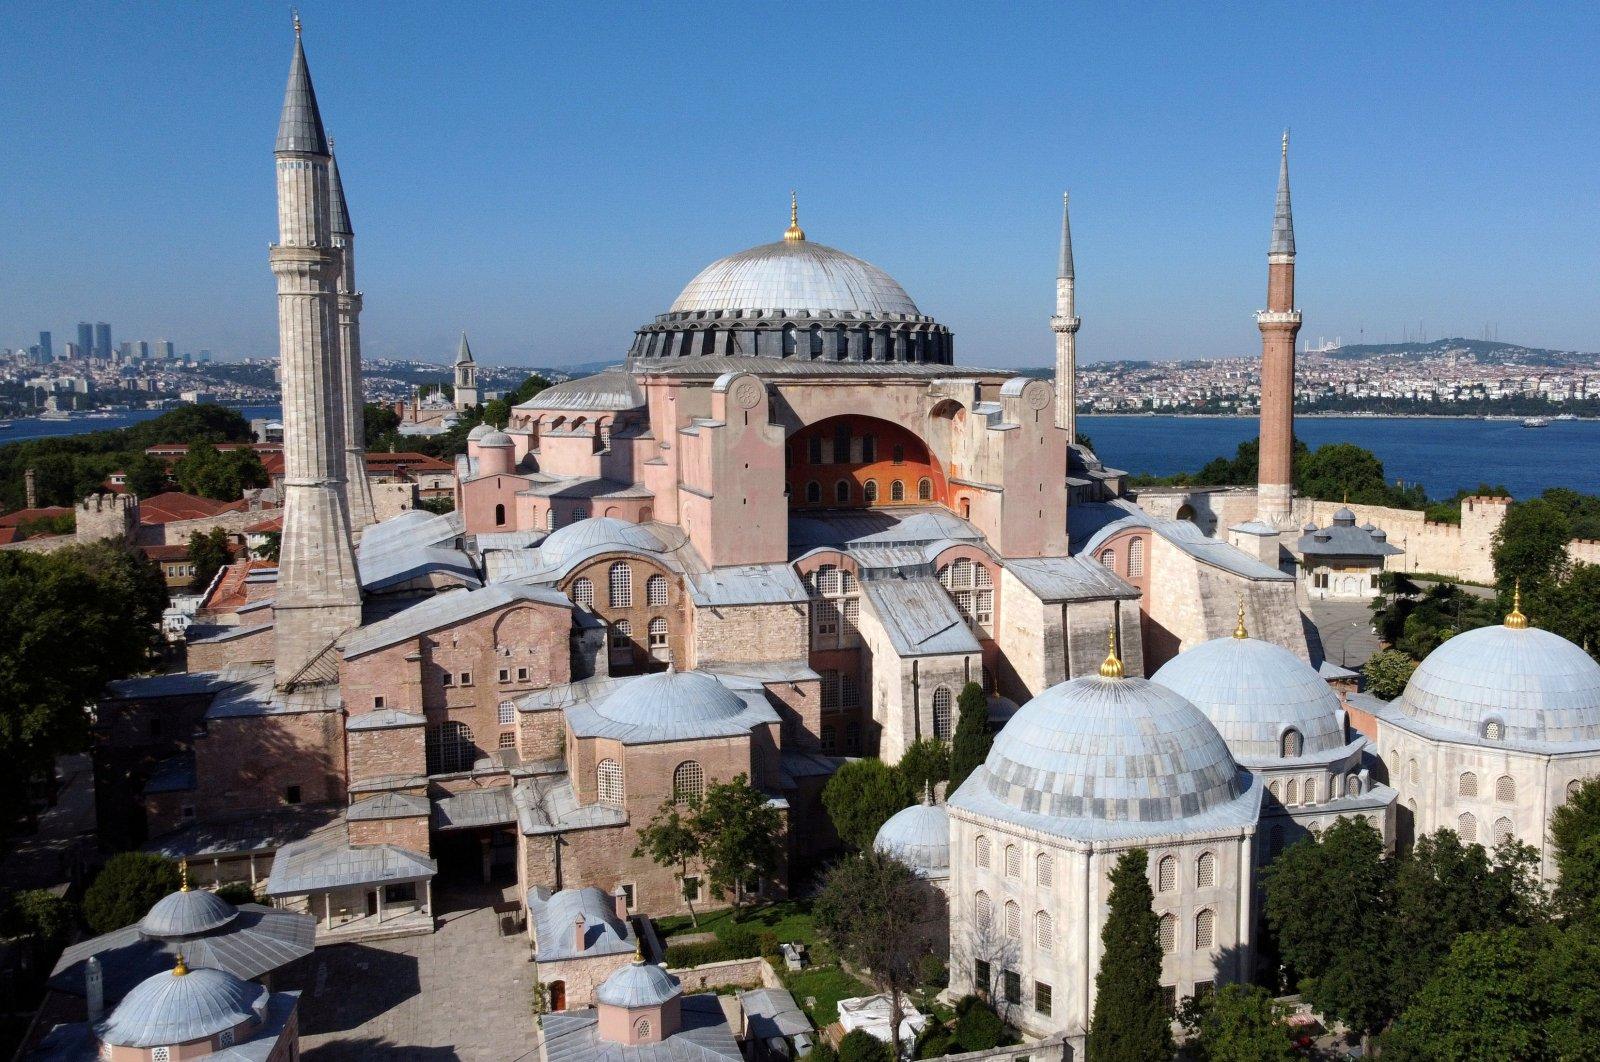 Hagia Sophia, a UNESCO World Heritage Site, is seen in Istanbul, Turkey, June 28, 2020. (Reuters Photo)